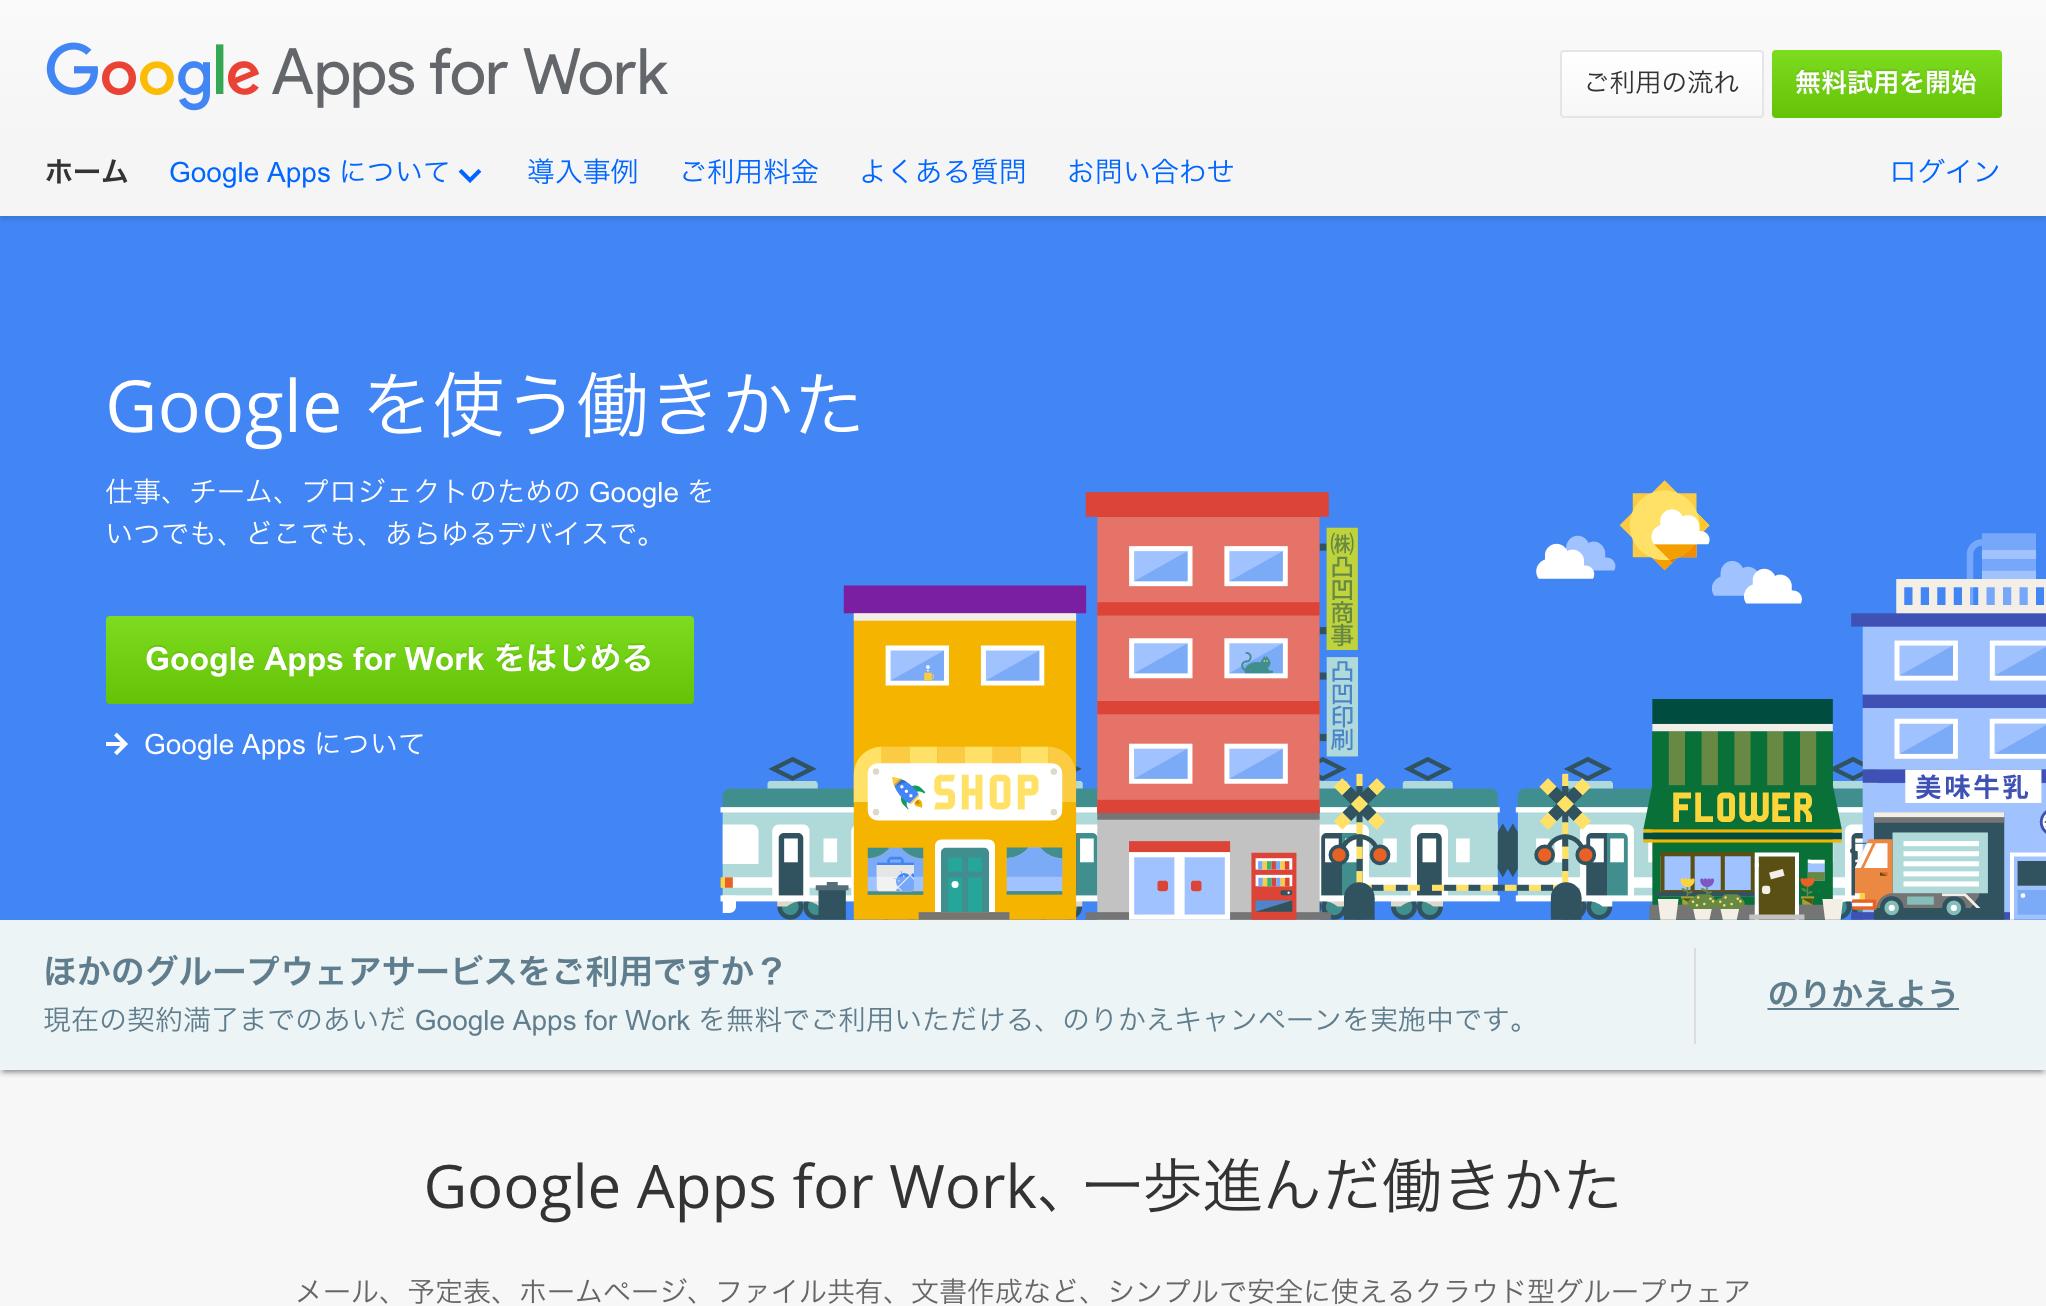 Google Apps for Work   Google のクラウド型グループウェア.png